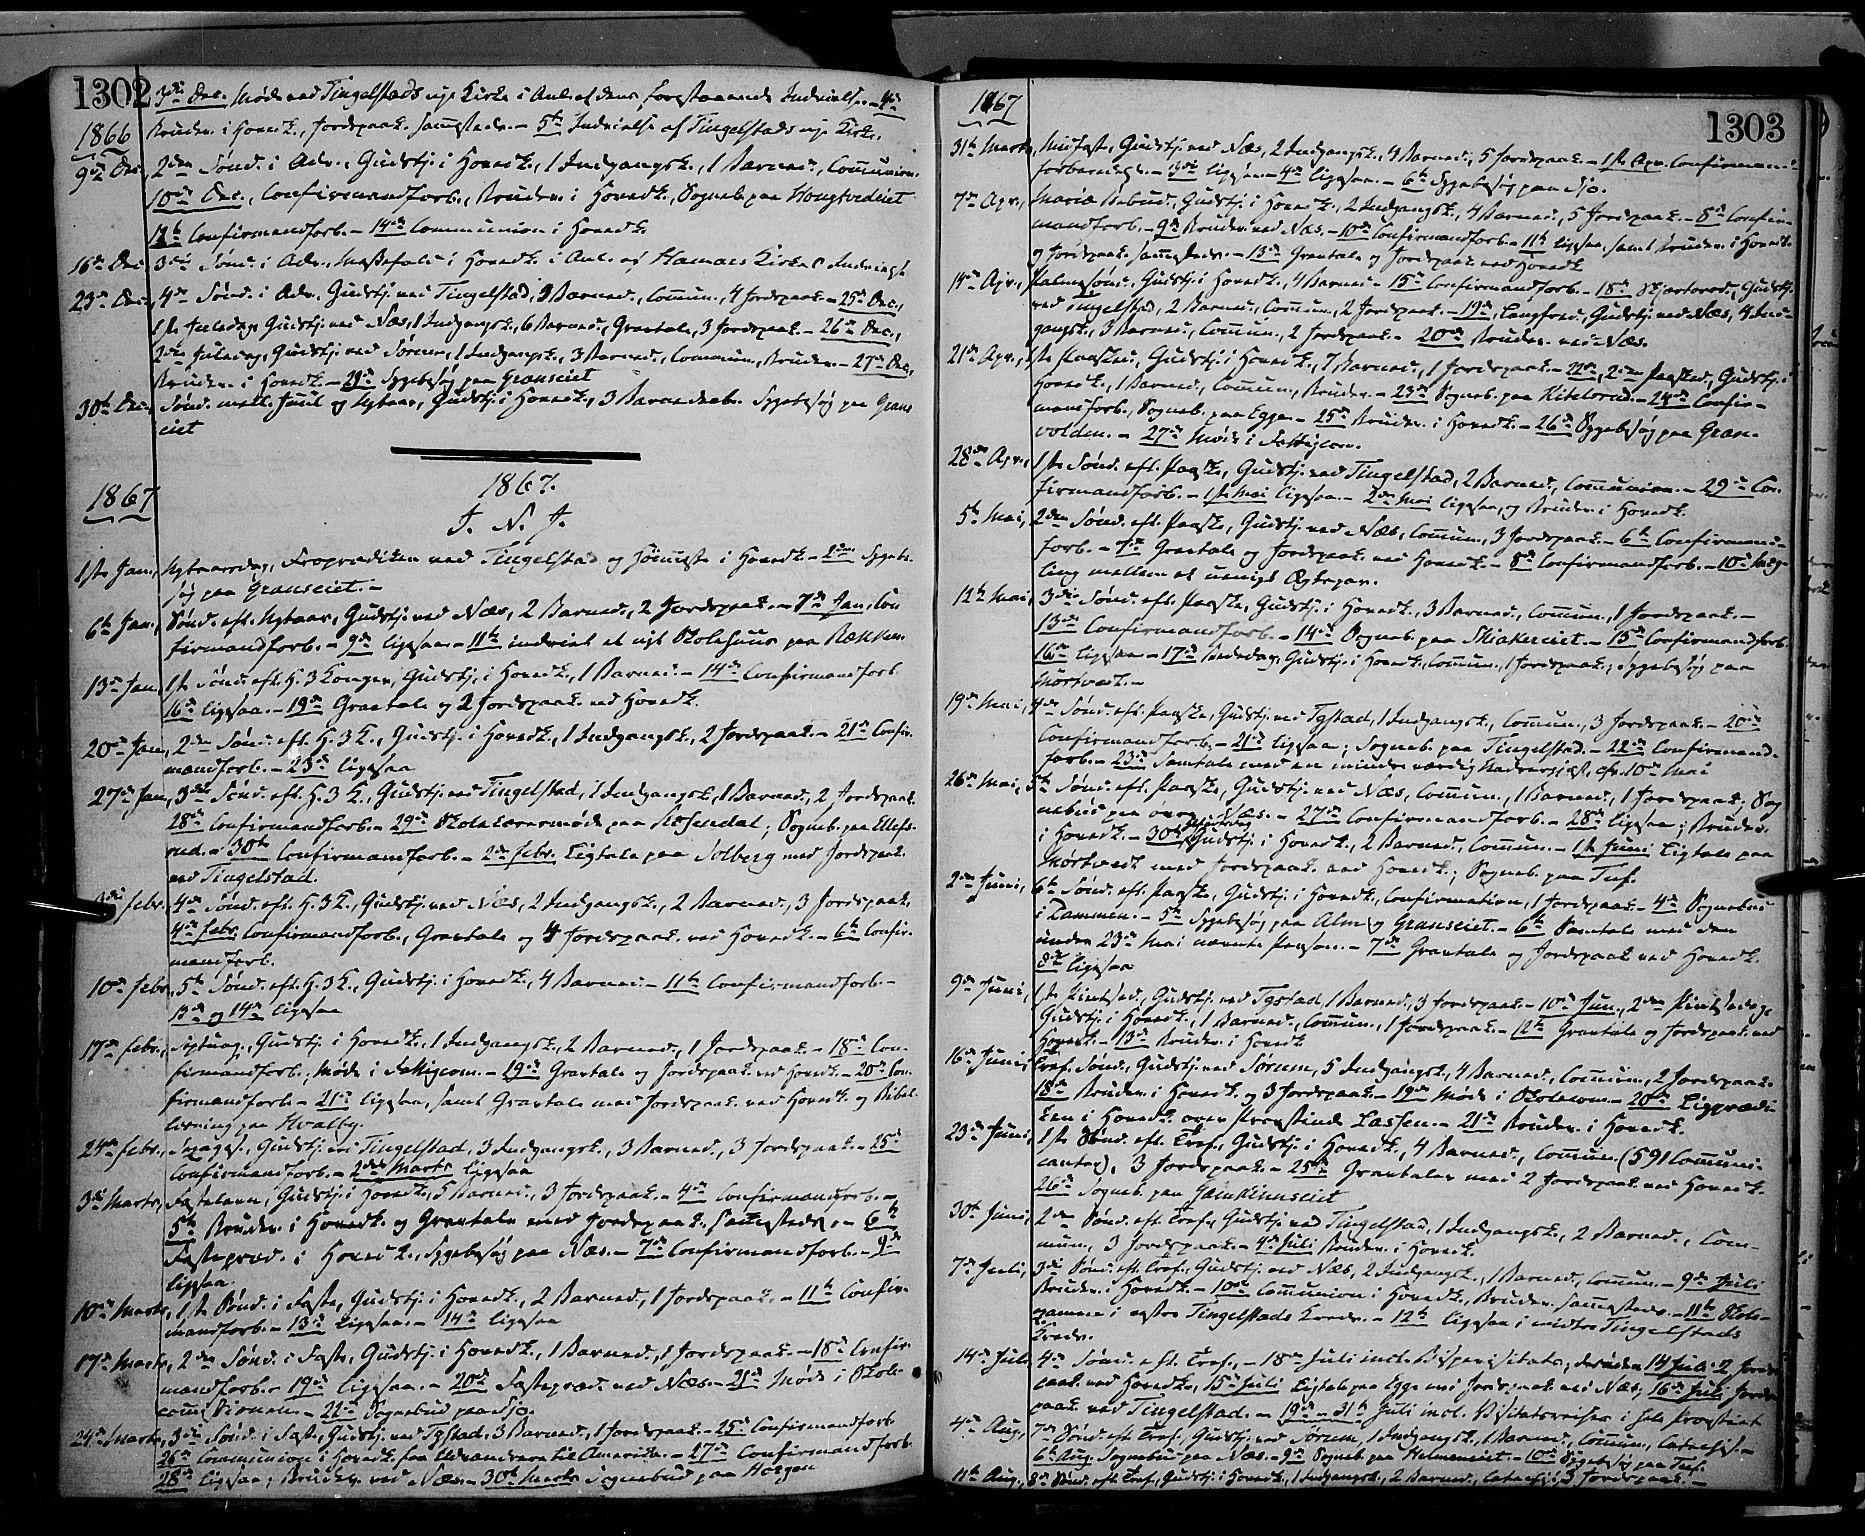 SAH, Gran prestekontor, Ministerialbok nr. 12, 1856-1874, s. 1302-1303